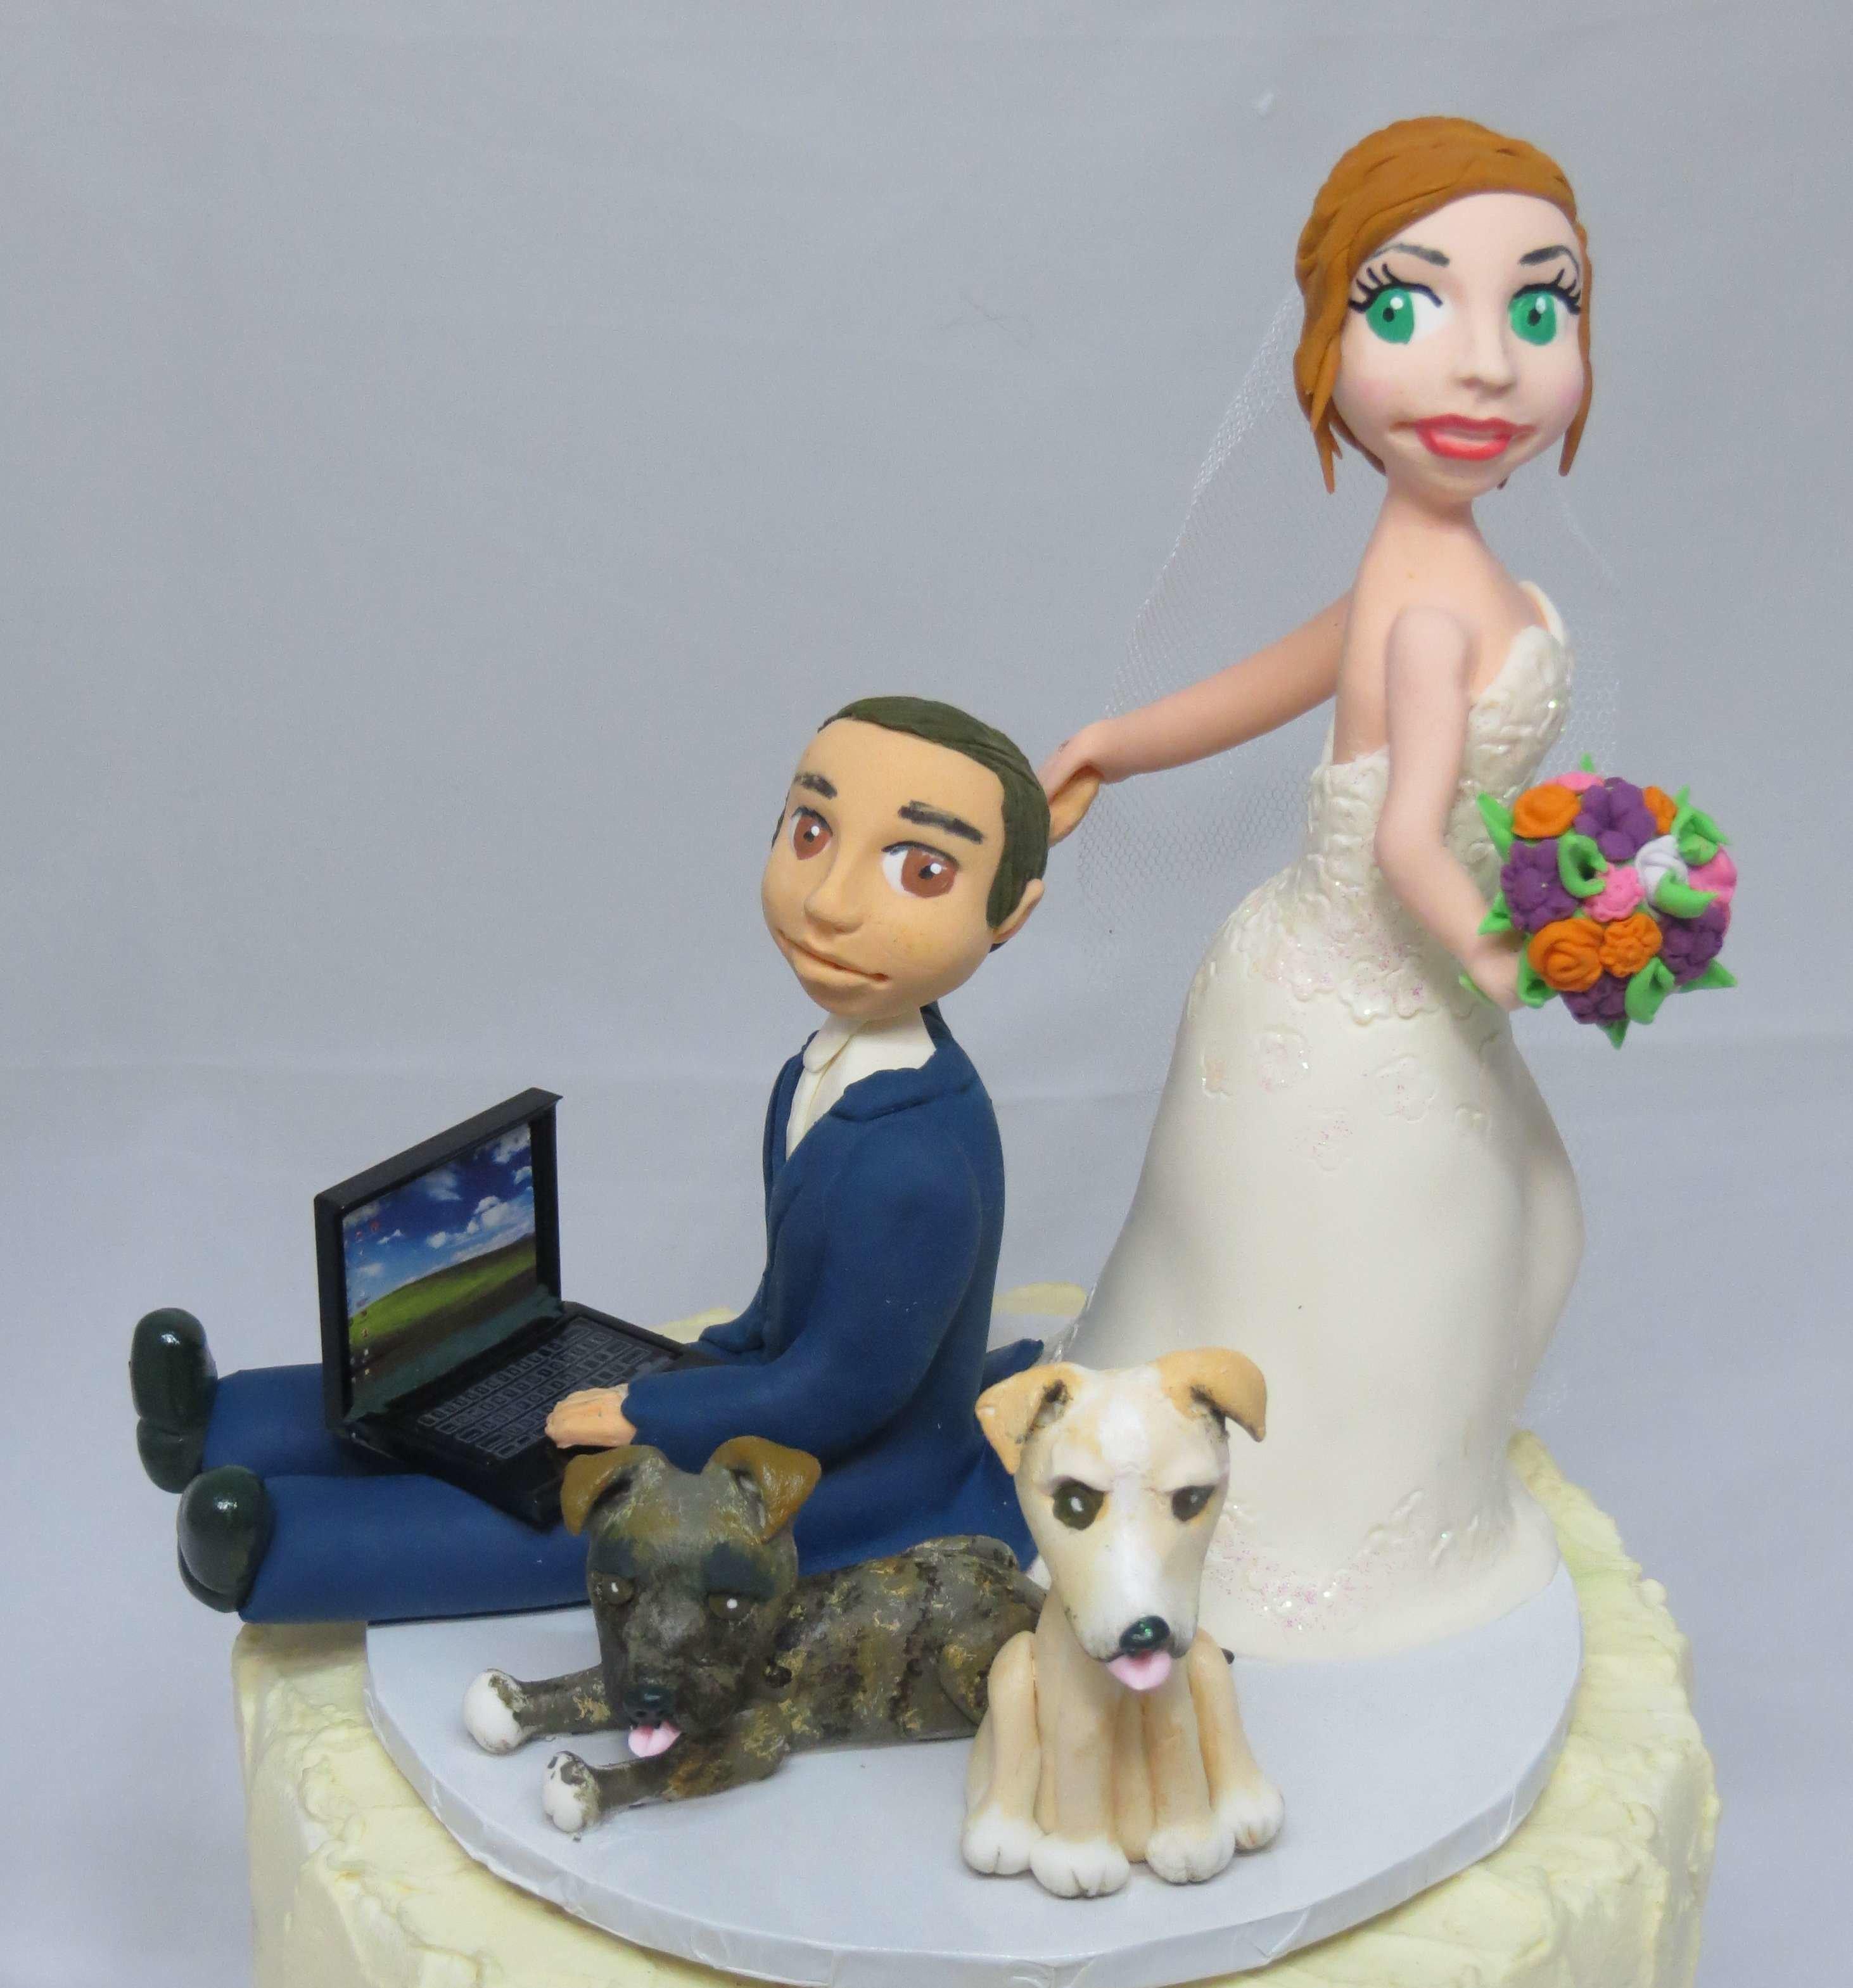 Bride Dragging Groom style on base board